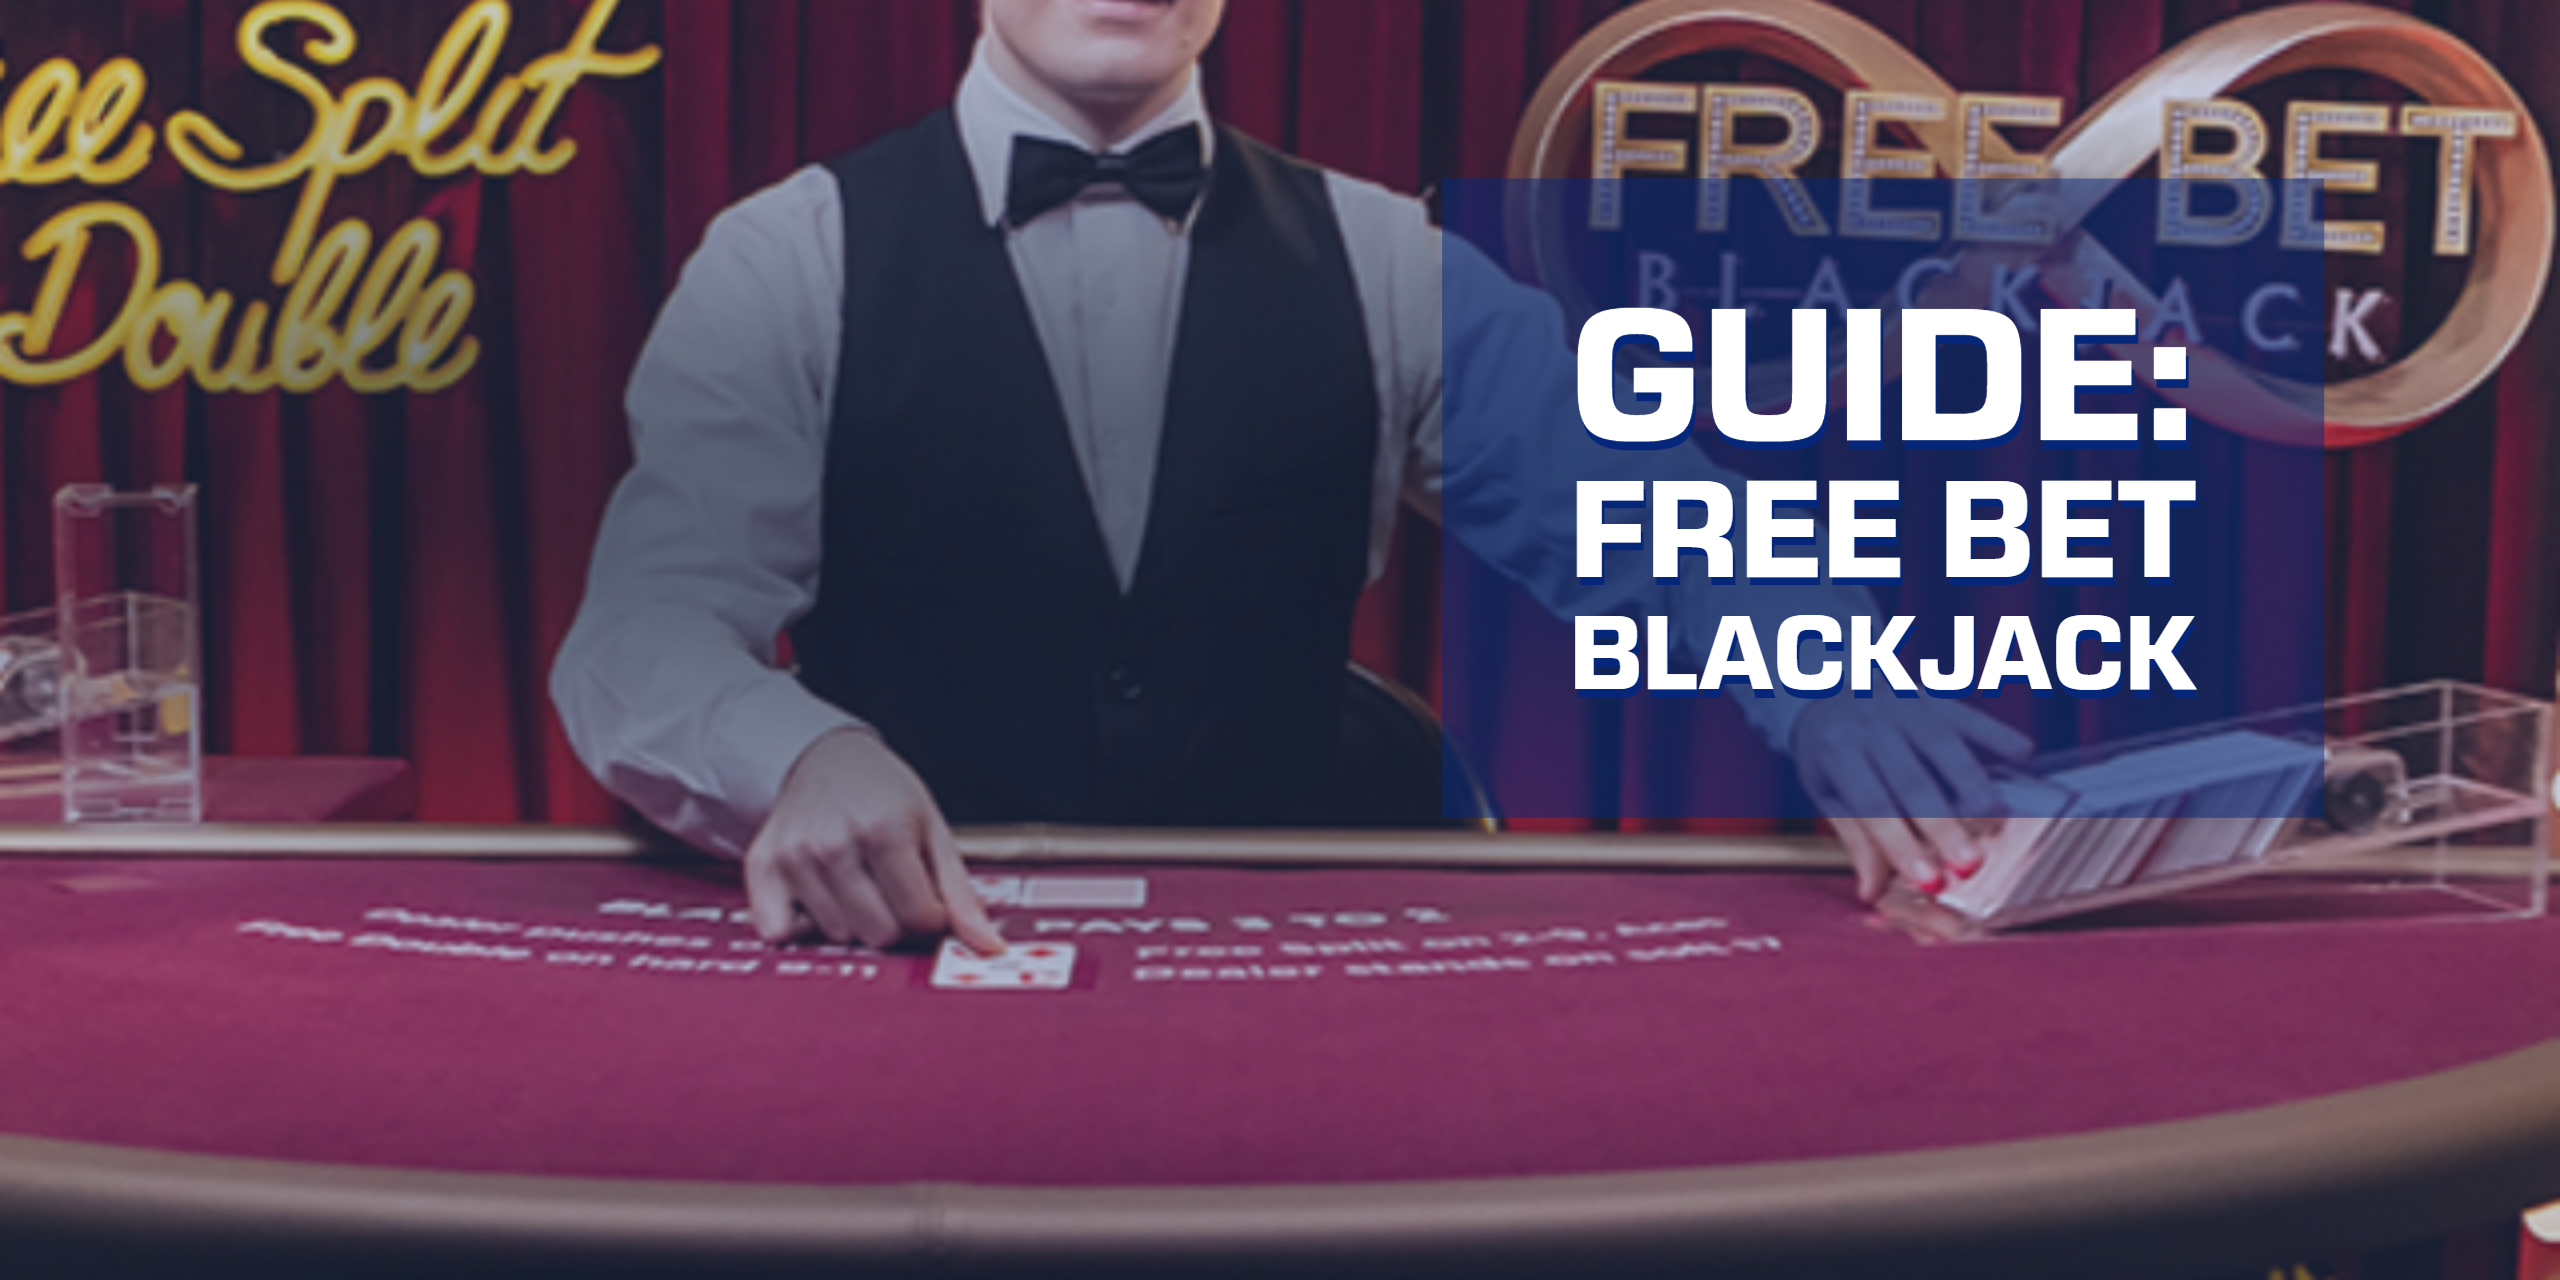 Free Bet Blackjack guide